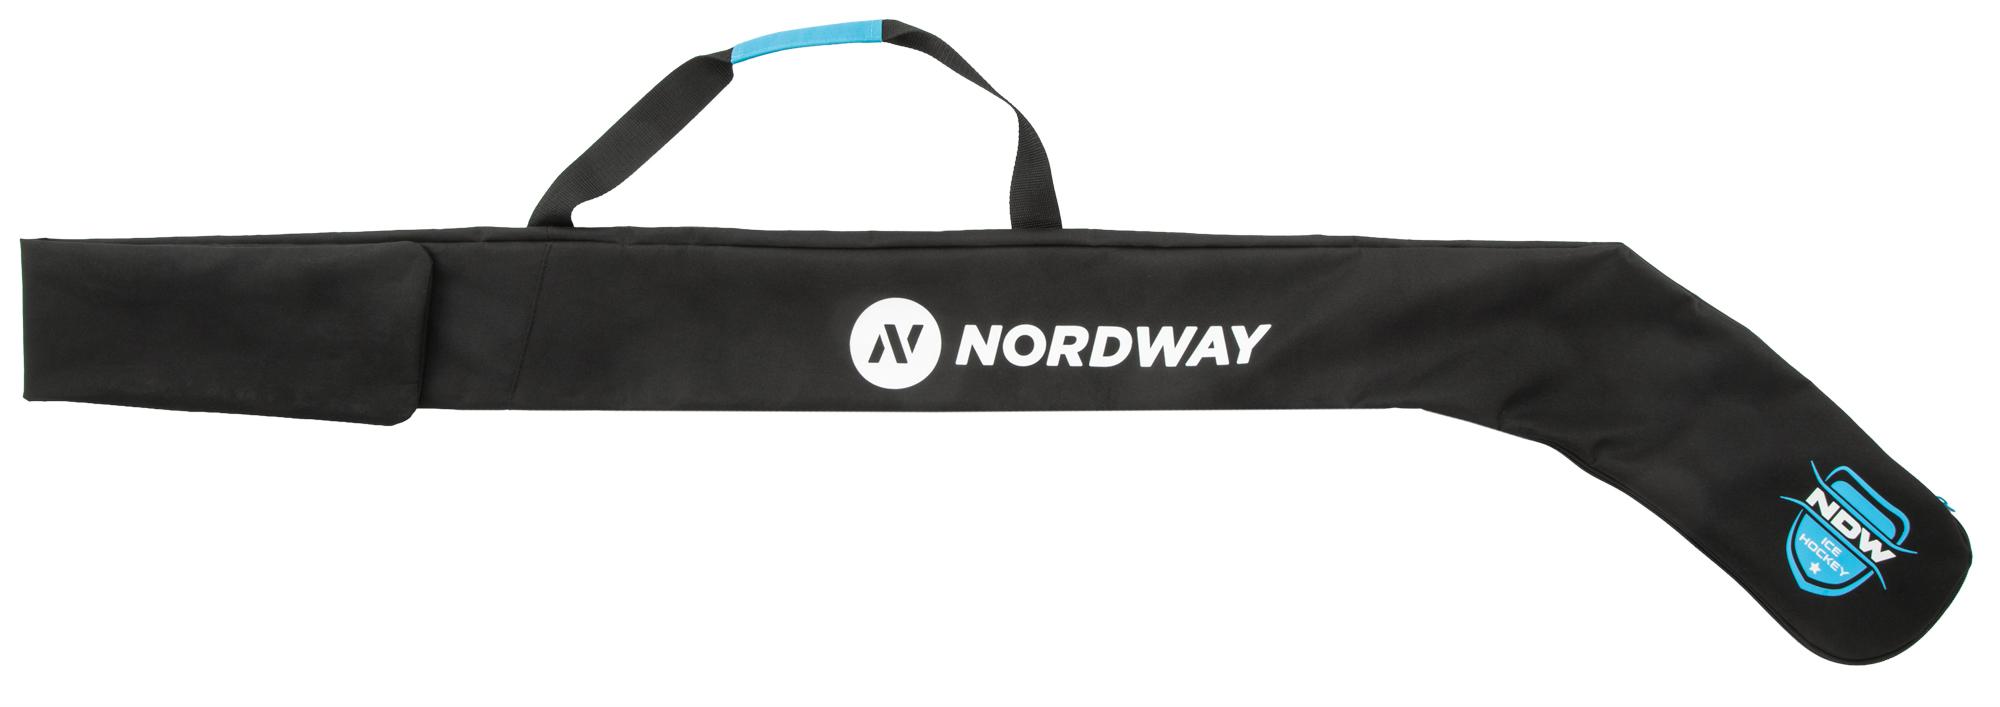 Nordway Чехол для клюшек Nordway nordway палки для беговых лыж женские nordway bliss